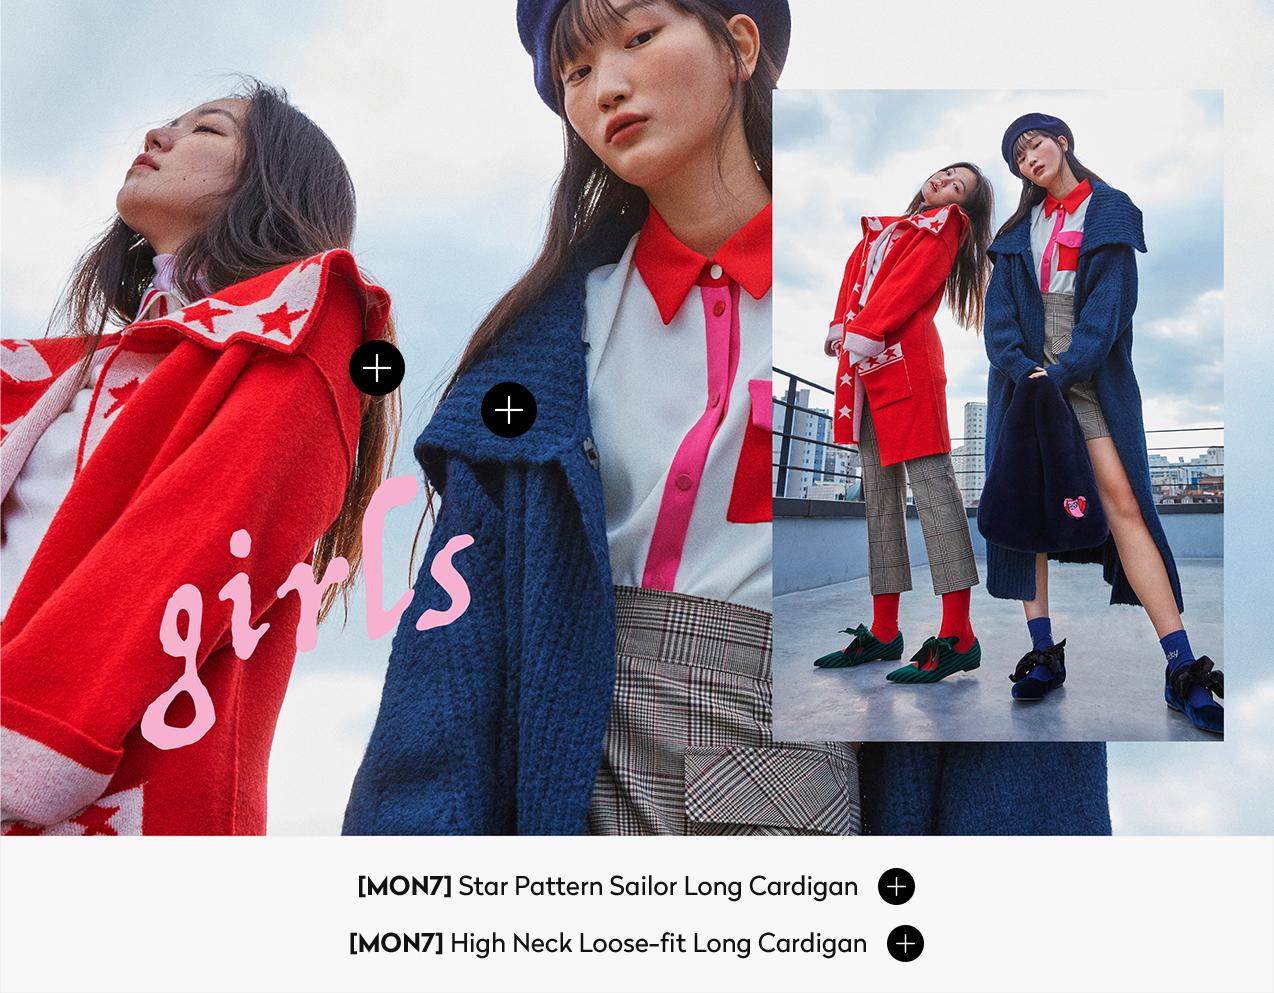 [MON7] Star Pattern Sailor Long Cardigan & [MON7] High Neck Loose-fit Long Cardigan